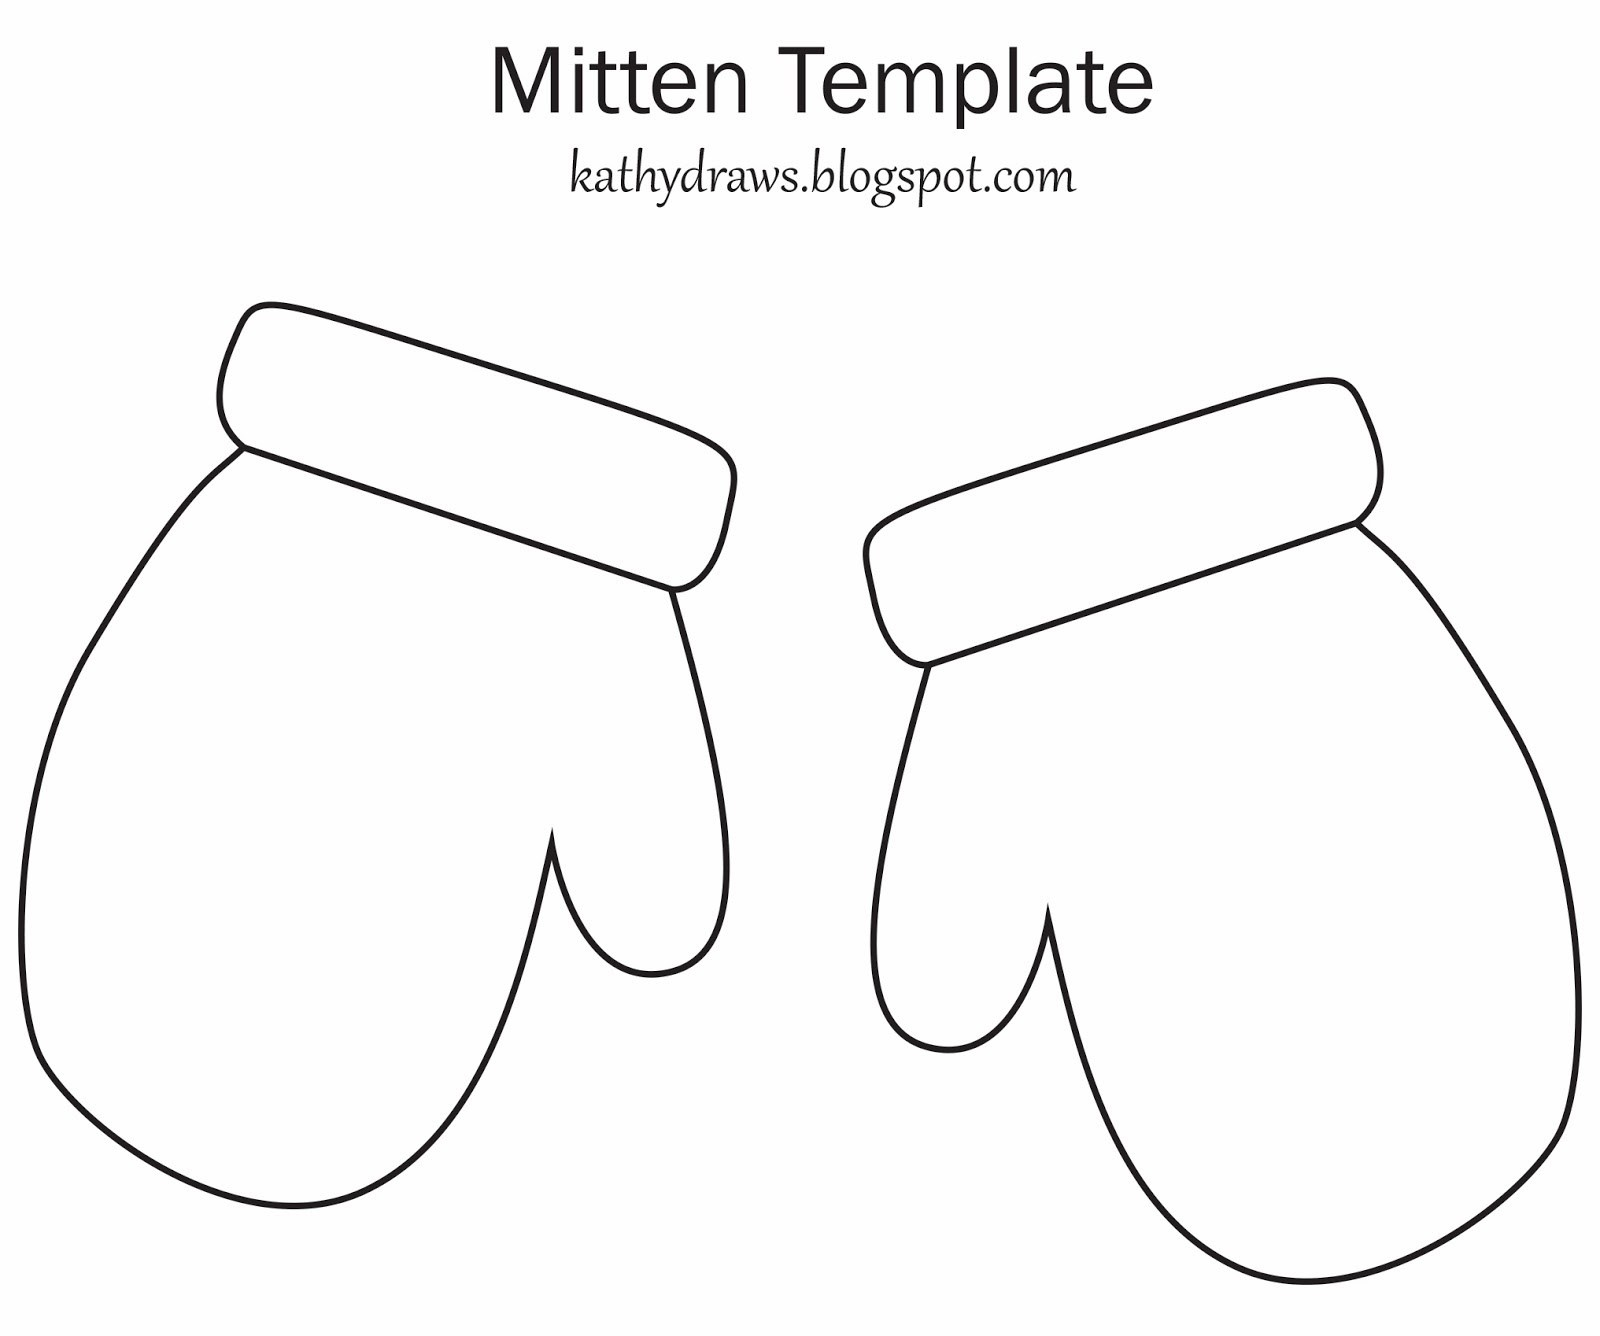 Mittens Template. Printable Mitten Template Mitten Pattern - Free Mitten Template Printable